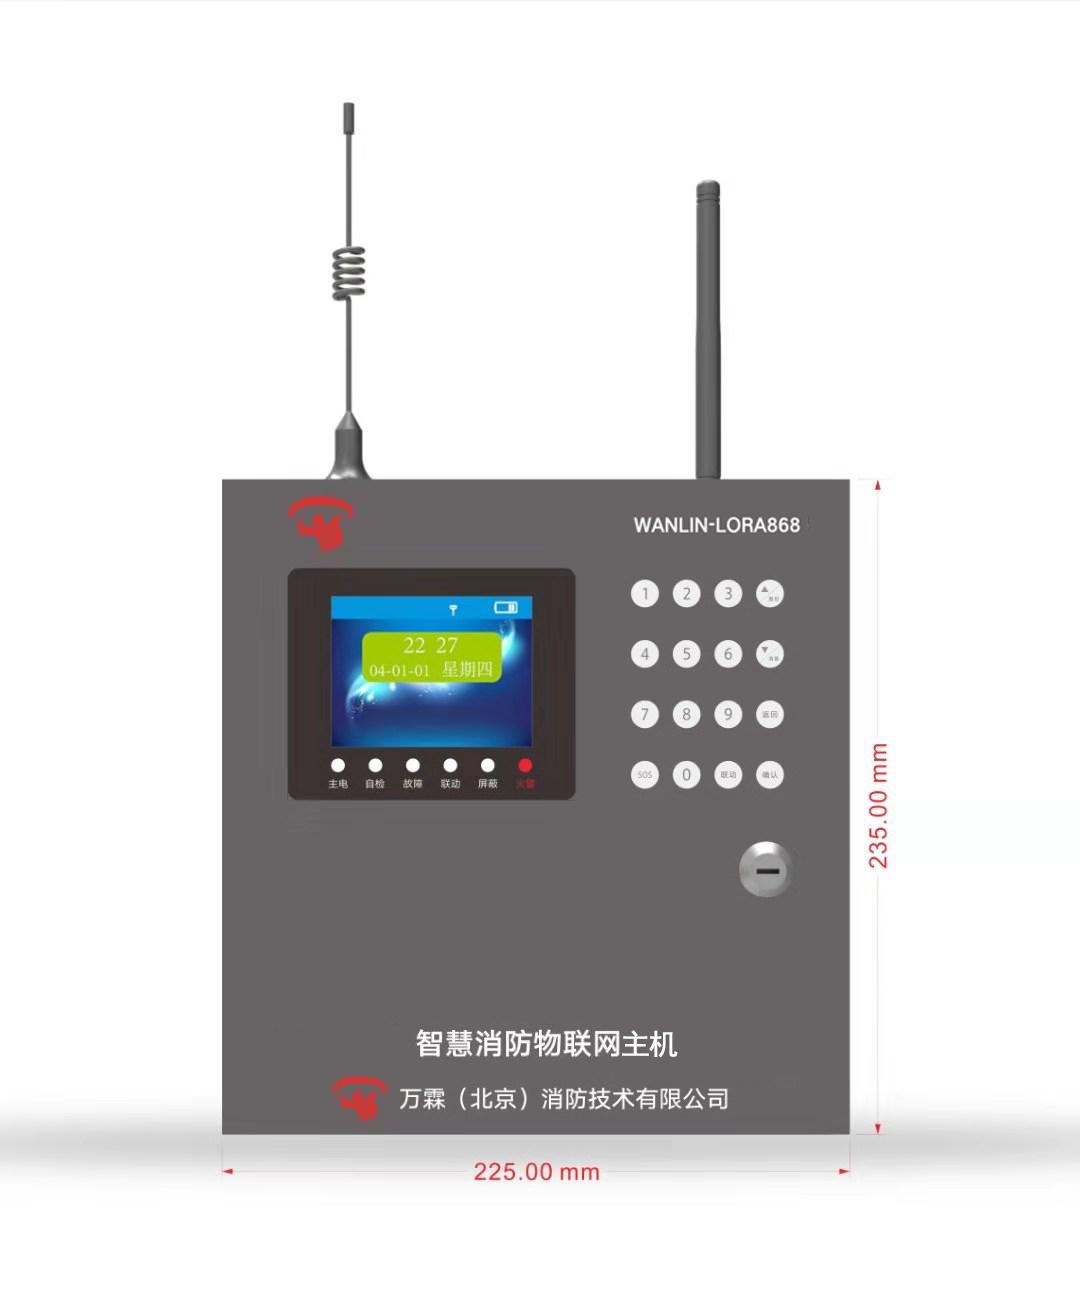 Lora868智慧无线消防报警系统主机